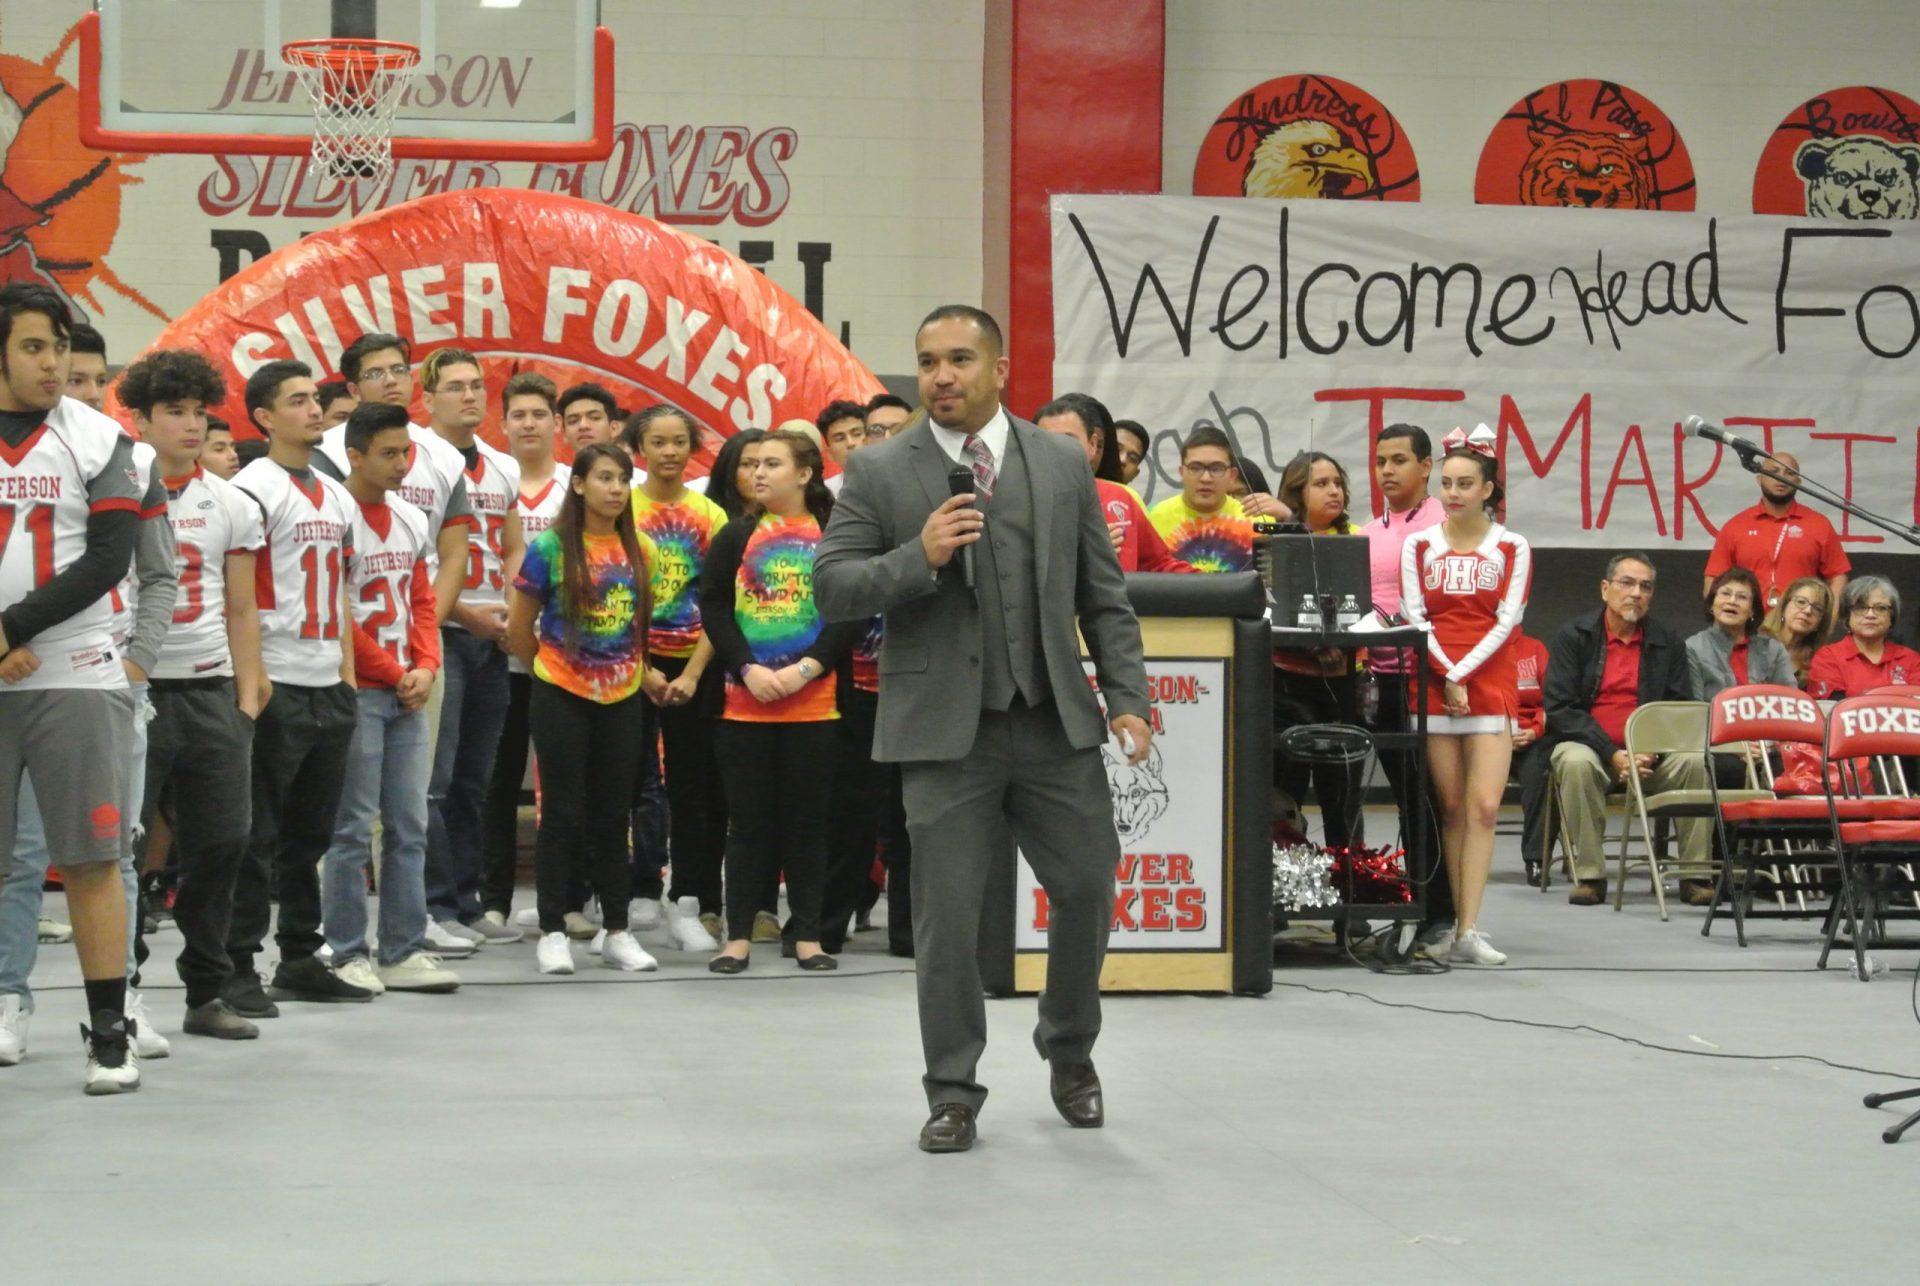 Tony Martinez Looking To Establish Winning Culture At El Paso Jefferson